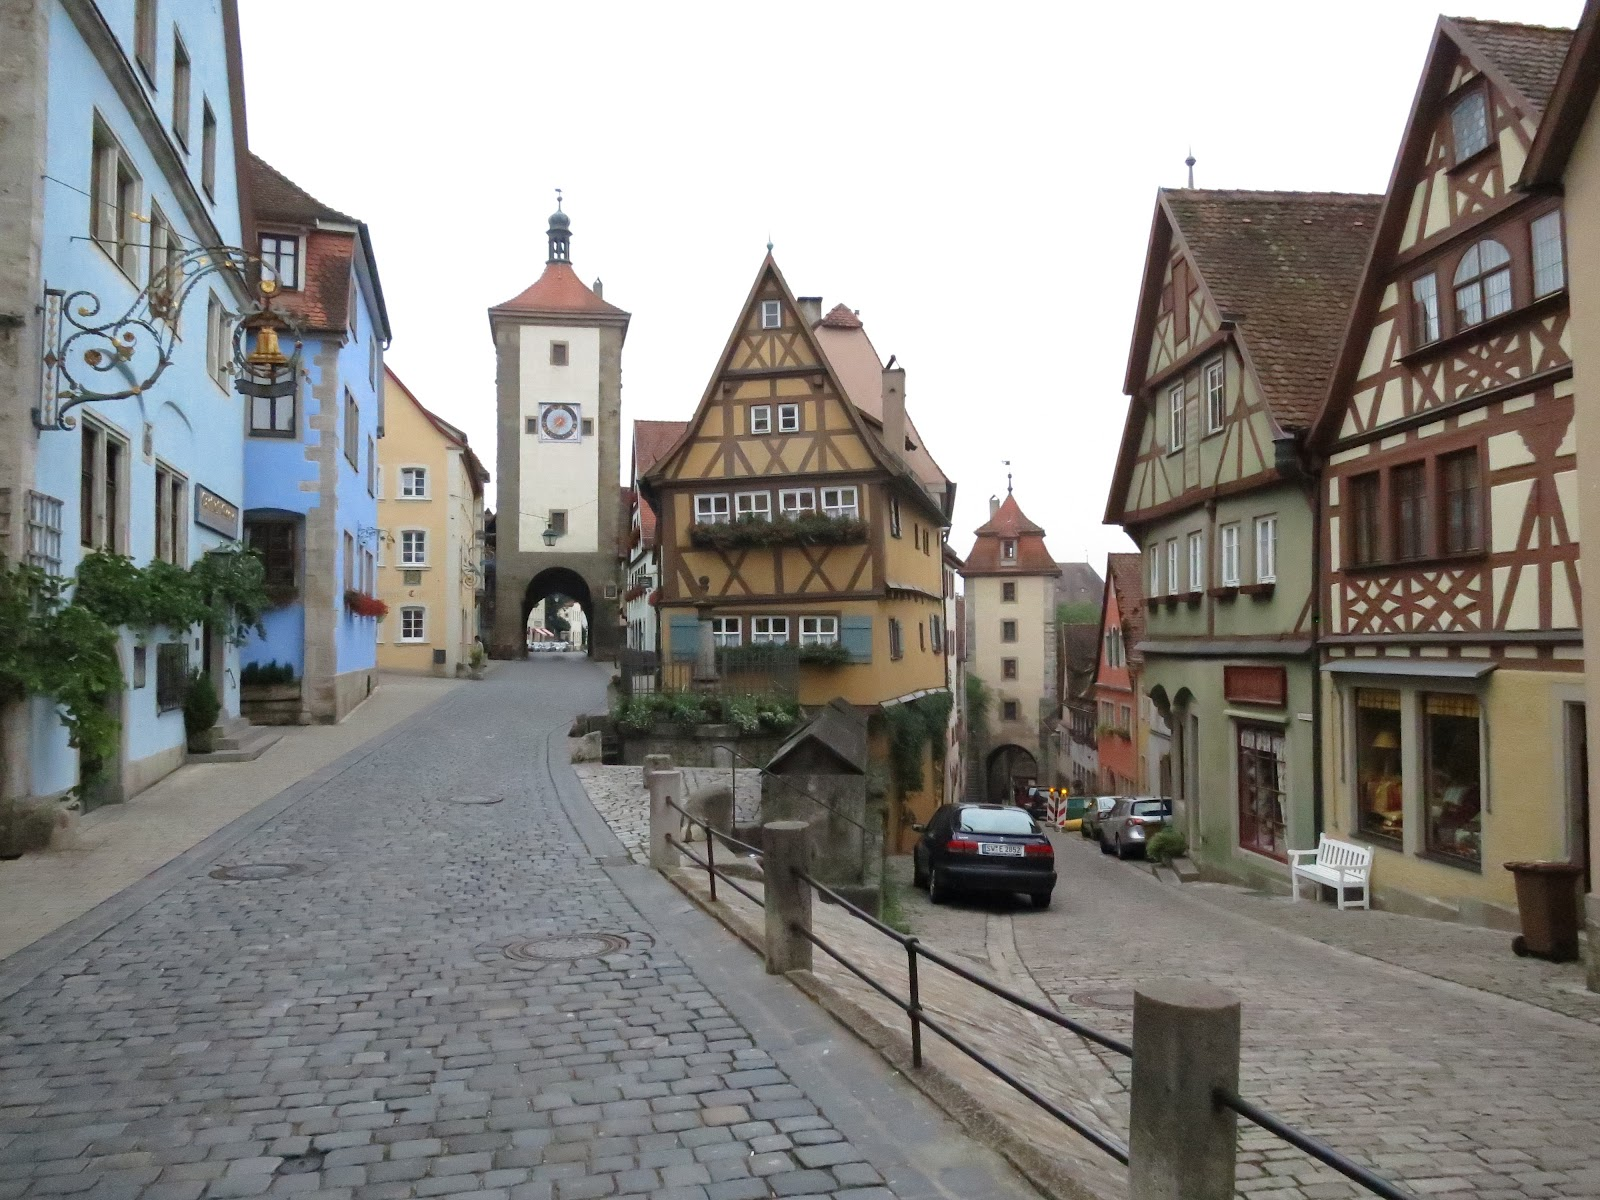 Leonardo旅遊小記: 德國(08/17)一 羅滕堡(Rothenburg)